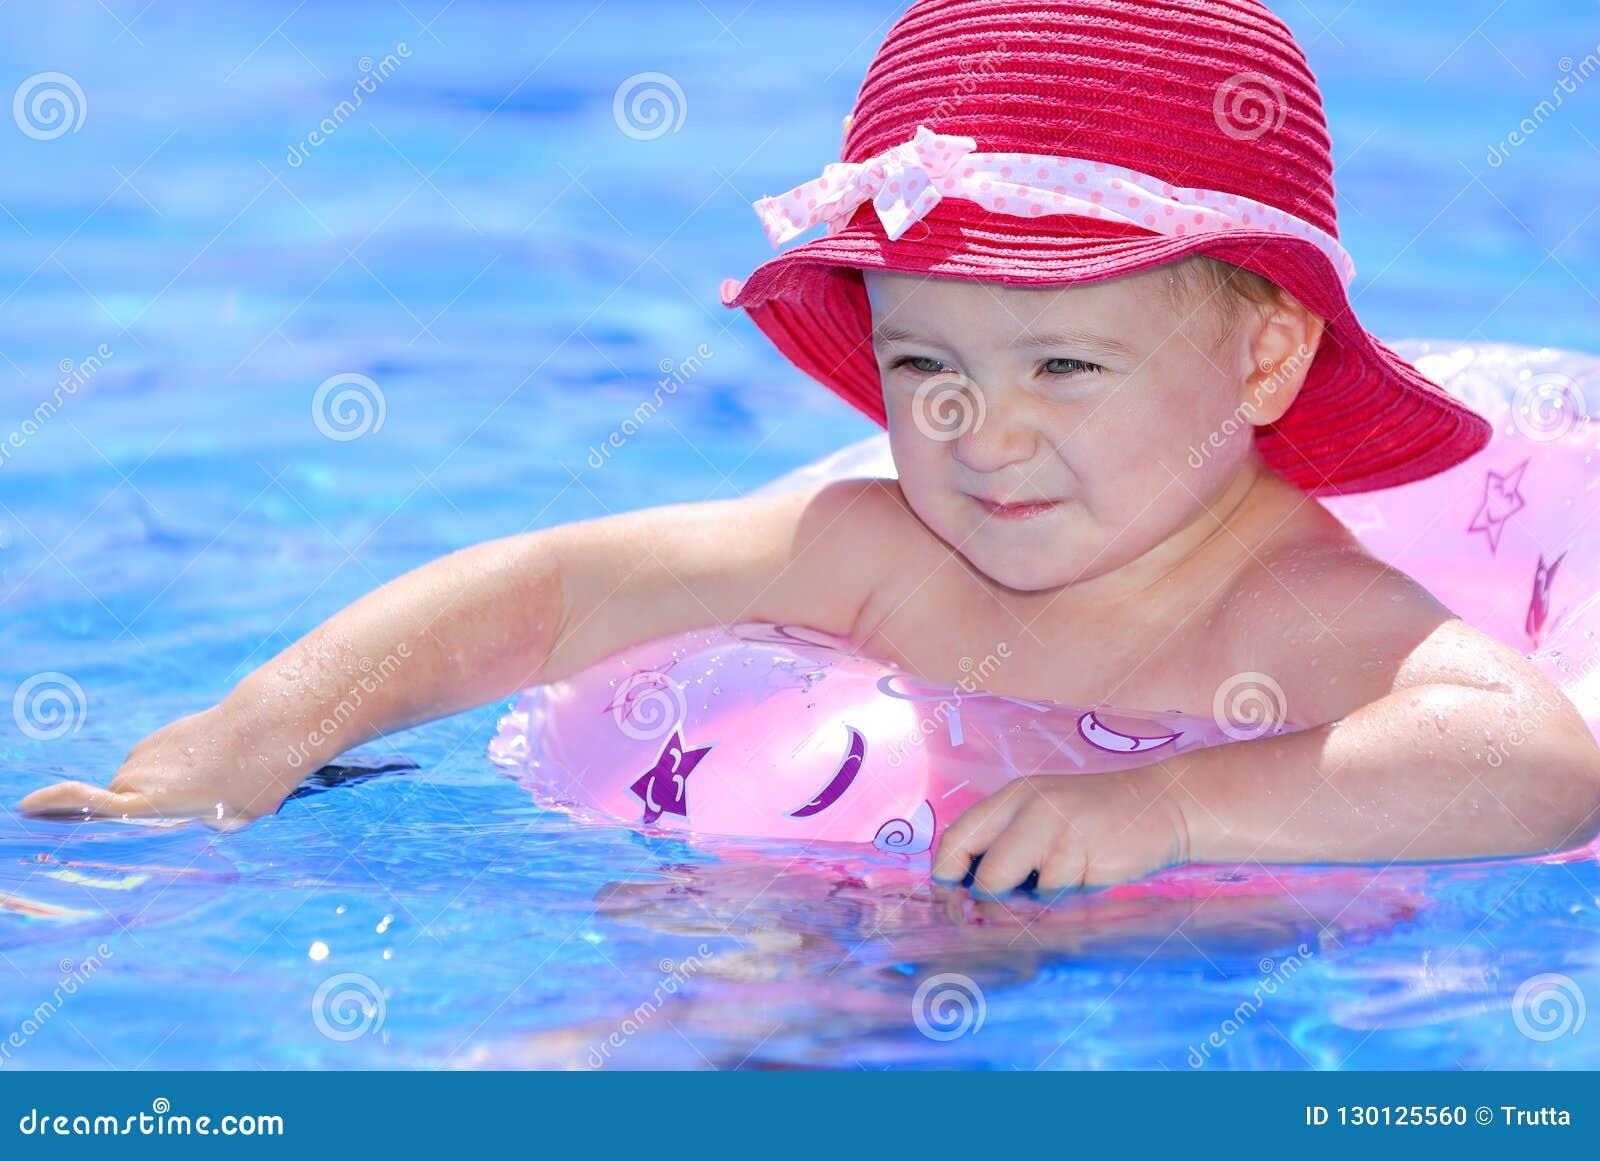 Muchacha linda que flota en un círculo inflable